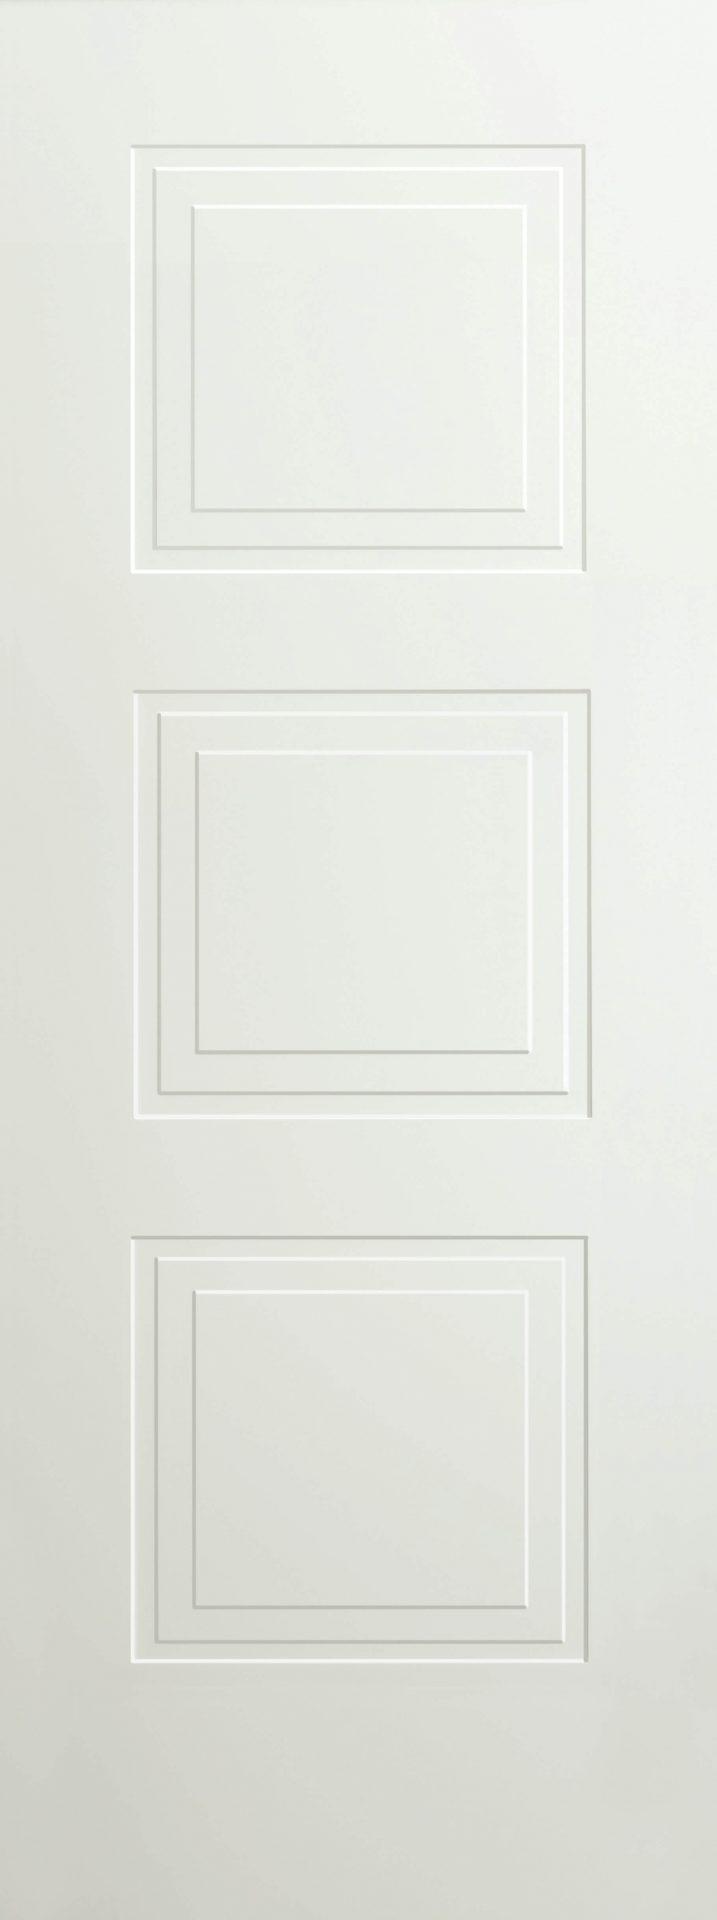 Bergerac 3p white